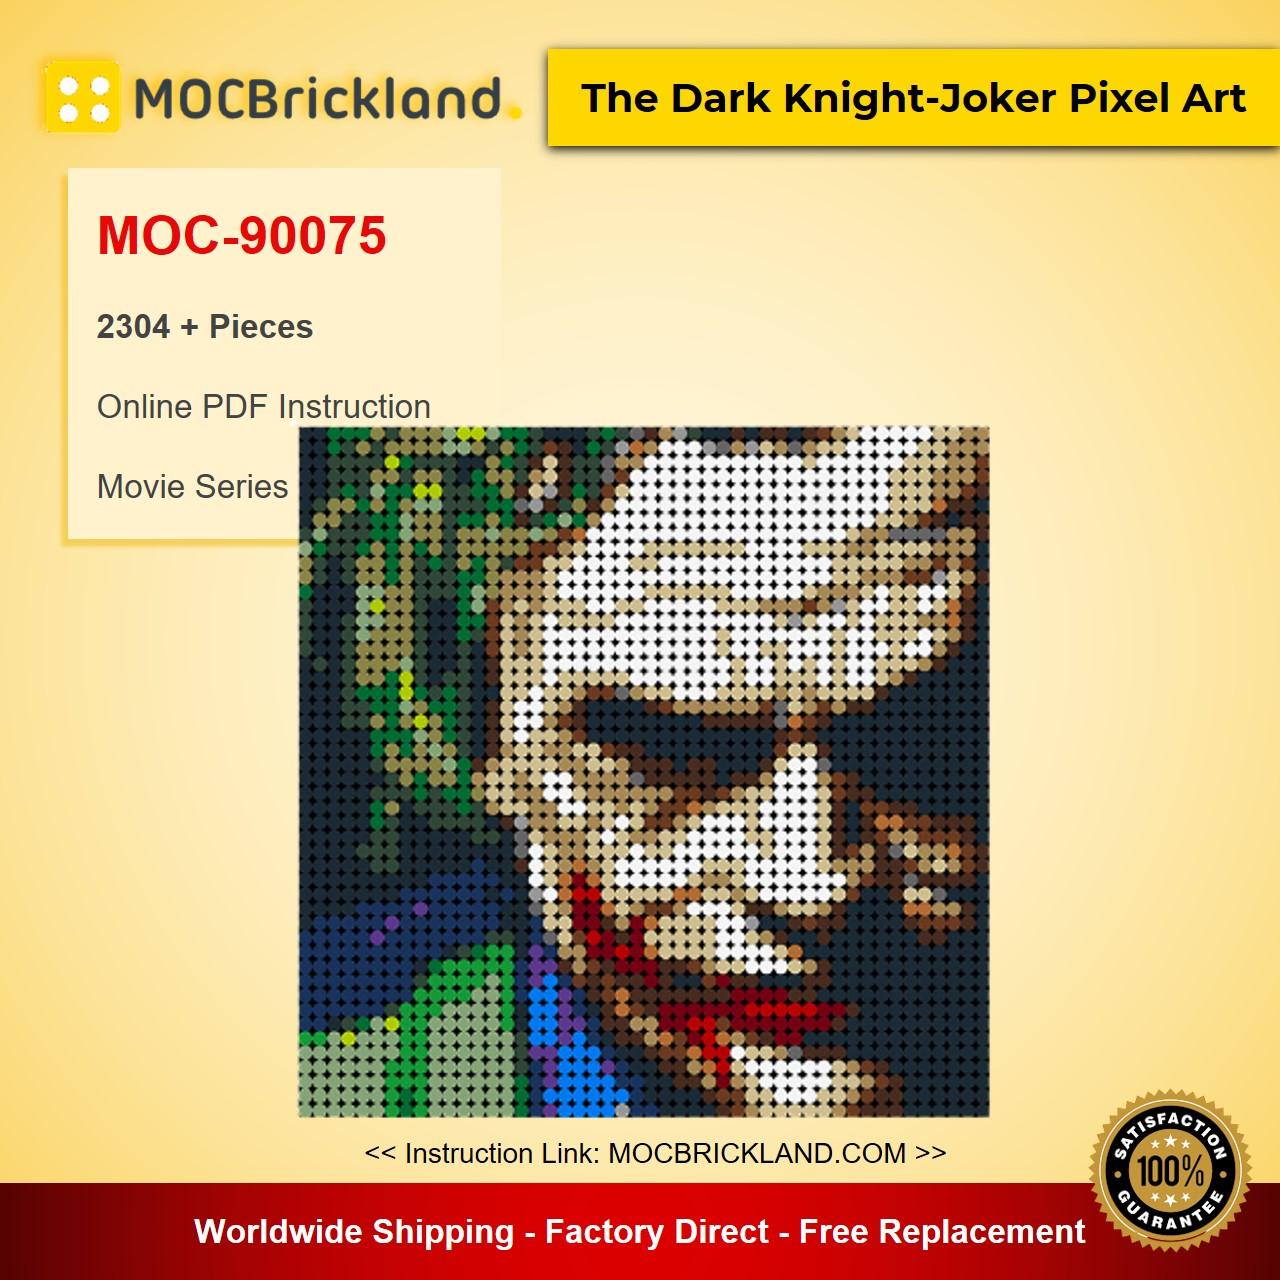 The Dark Knight-Joker Pixel Art MOC-90075 Movie With 2304 Pieces